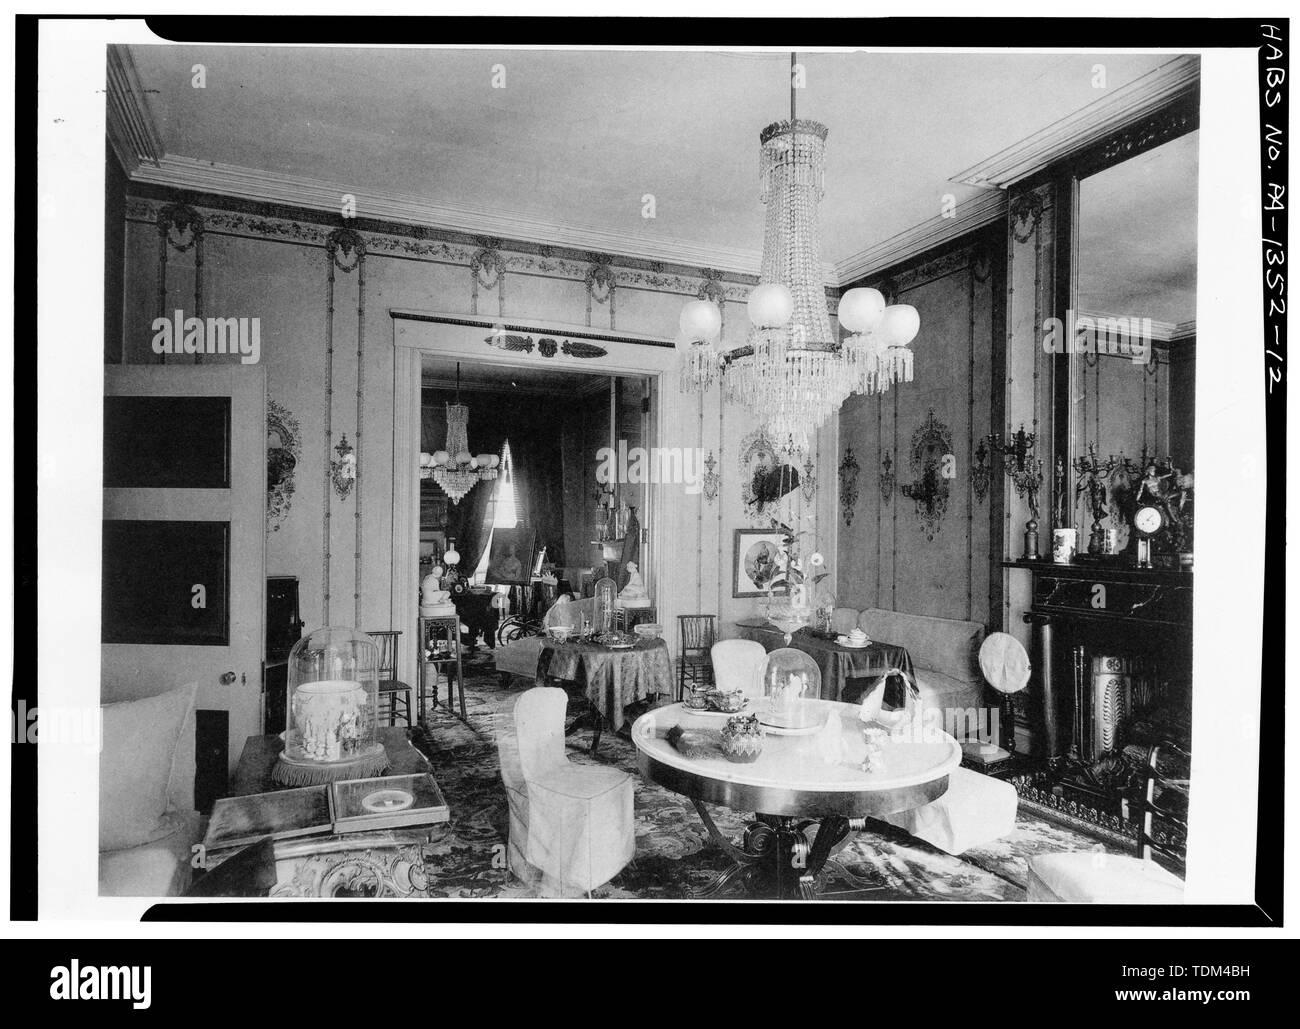 19th Century Parlor Stock Photos & 19th Century Parlor Stock